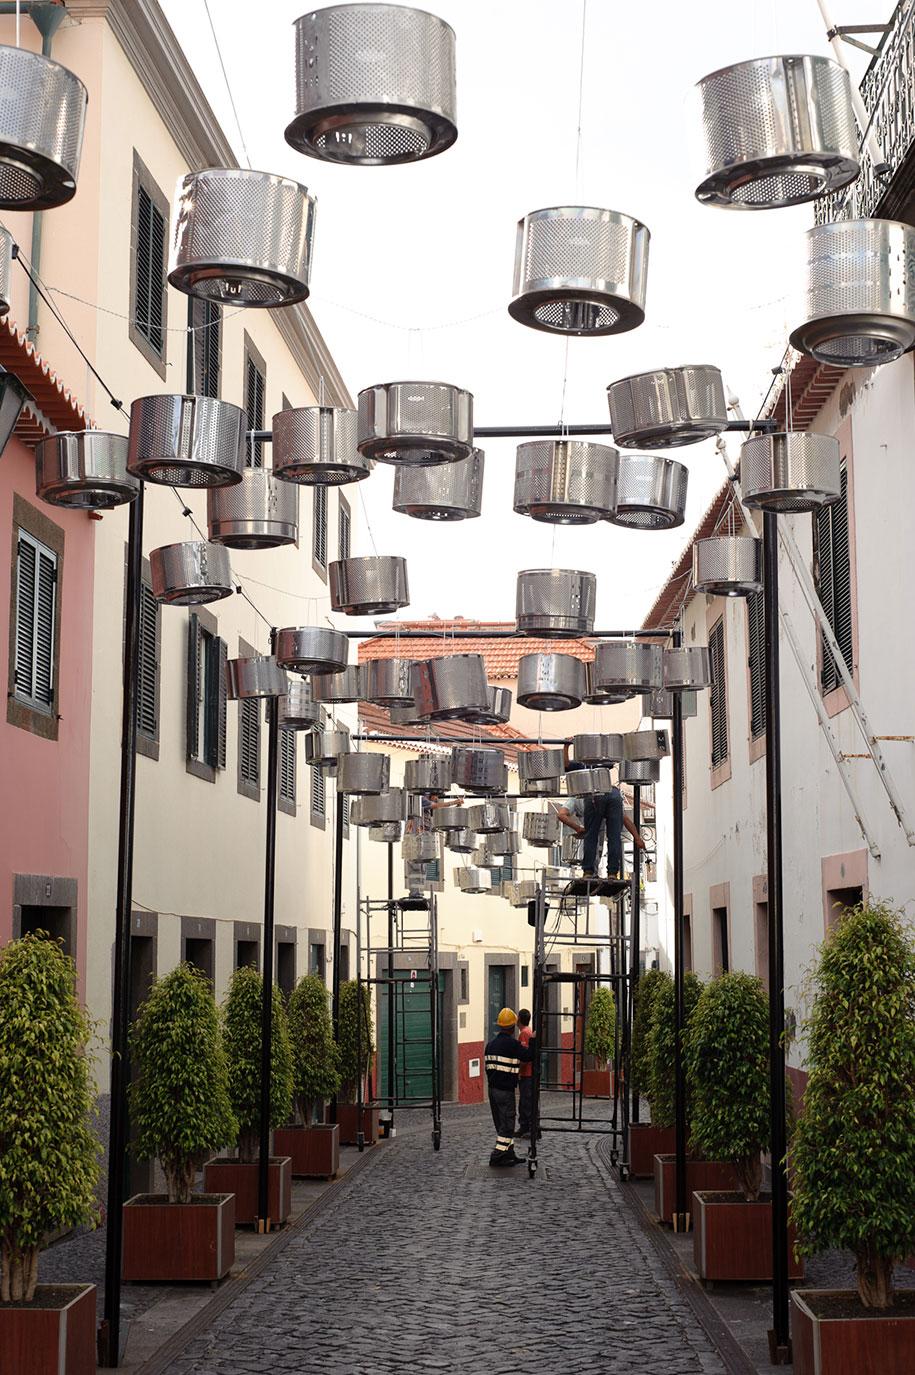 washing-machine-drum-lamps-teatro-metaphora-portugal-4